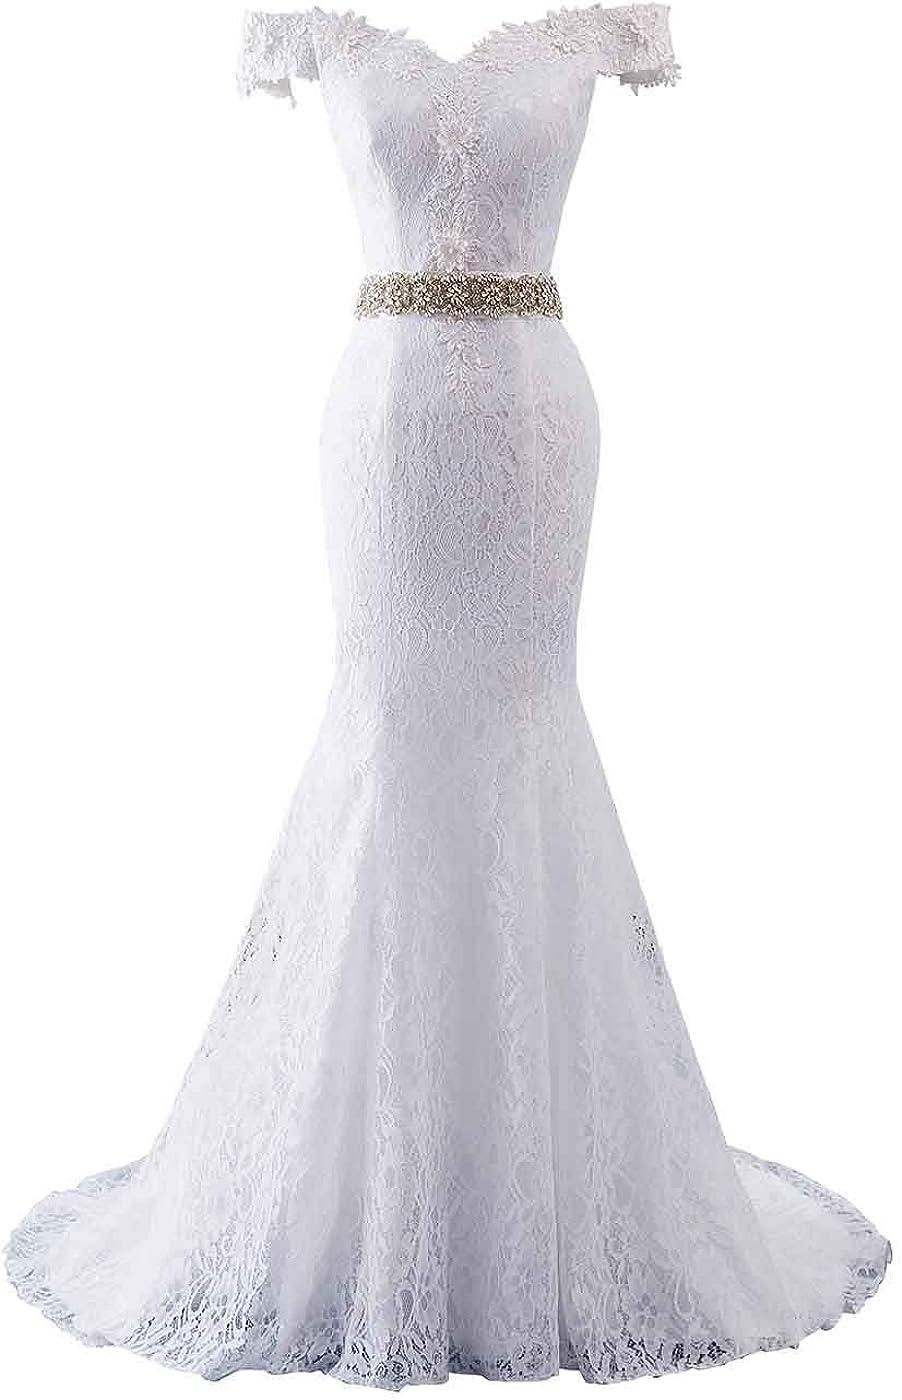 Changuan Women's Wedding Dresses for Bride Floral Lace Beach Wedding Dress Mermaid Bridal Gown